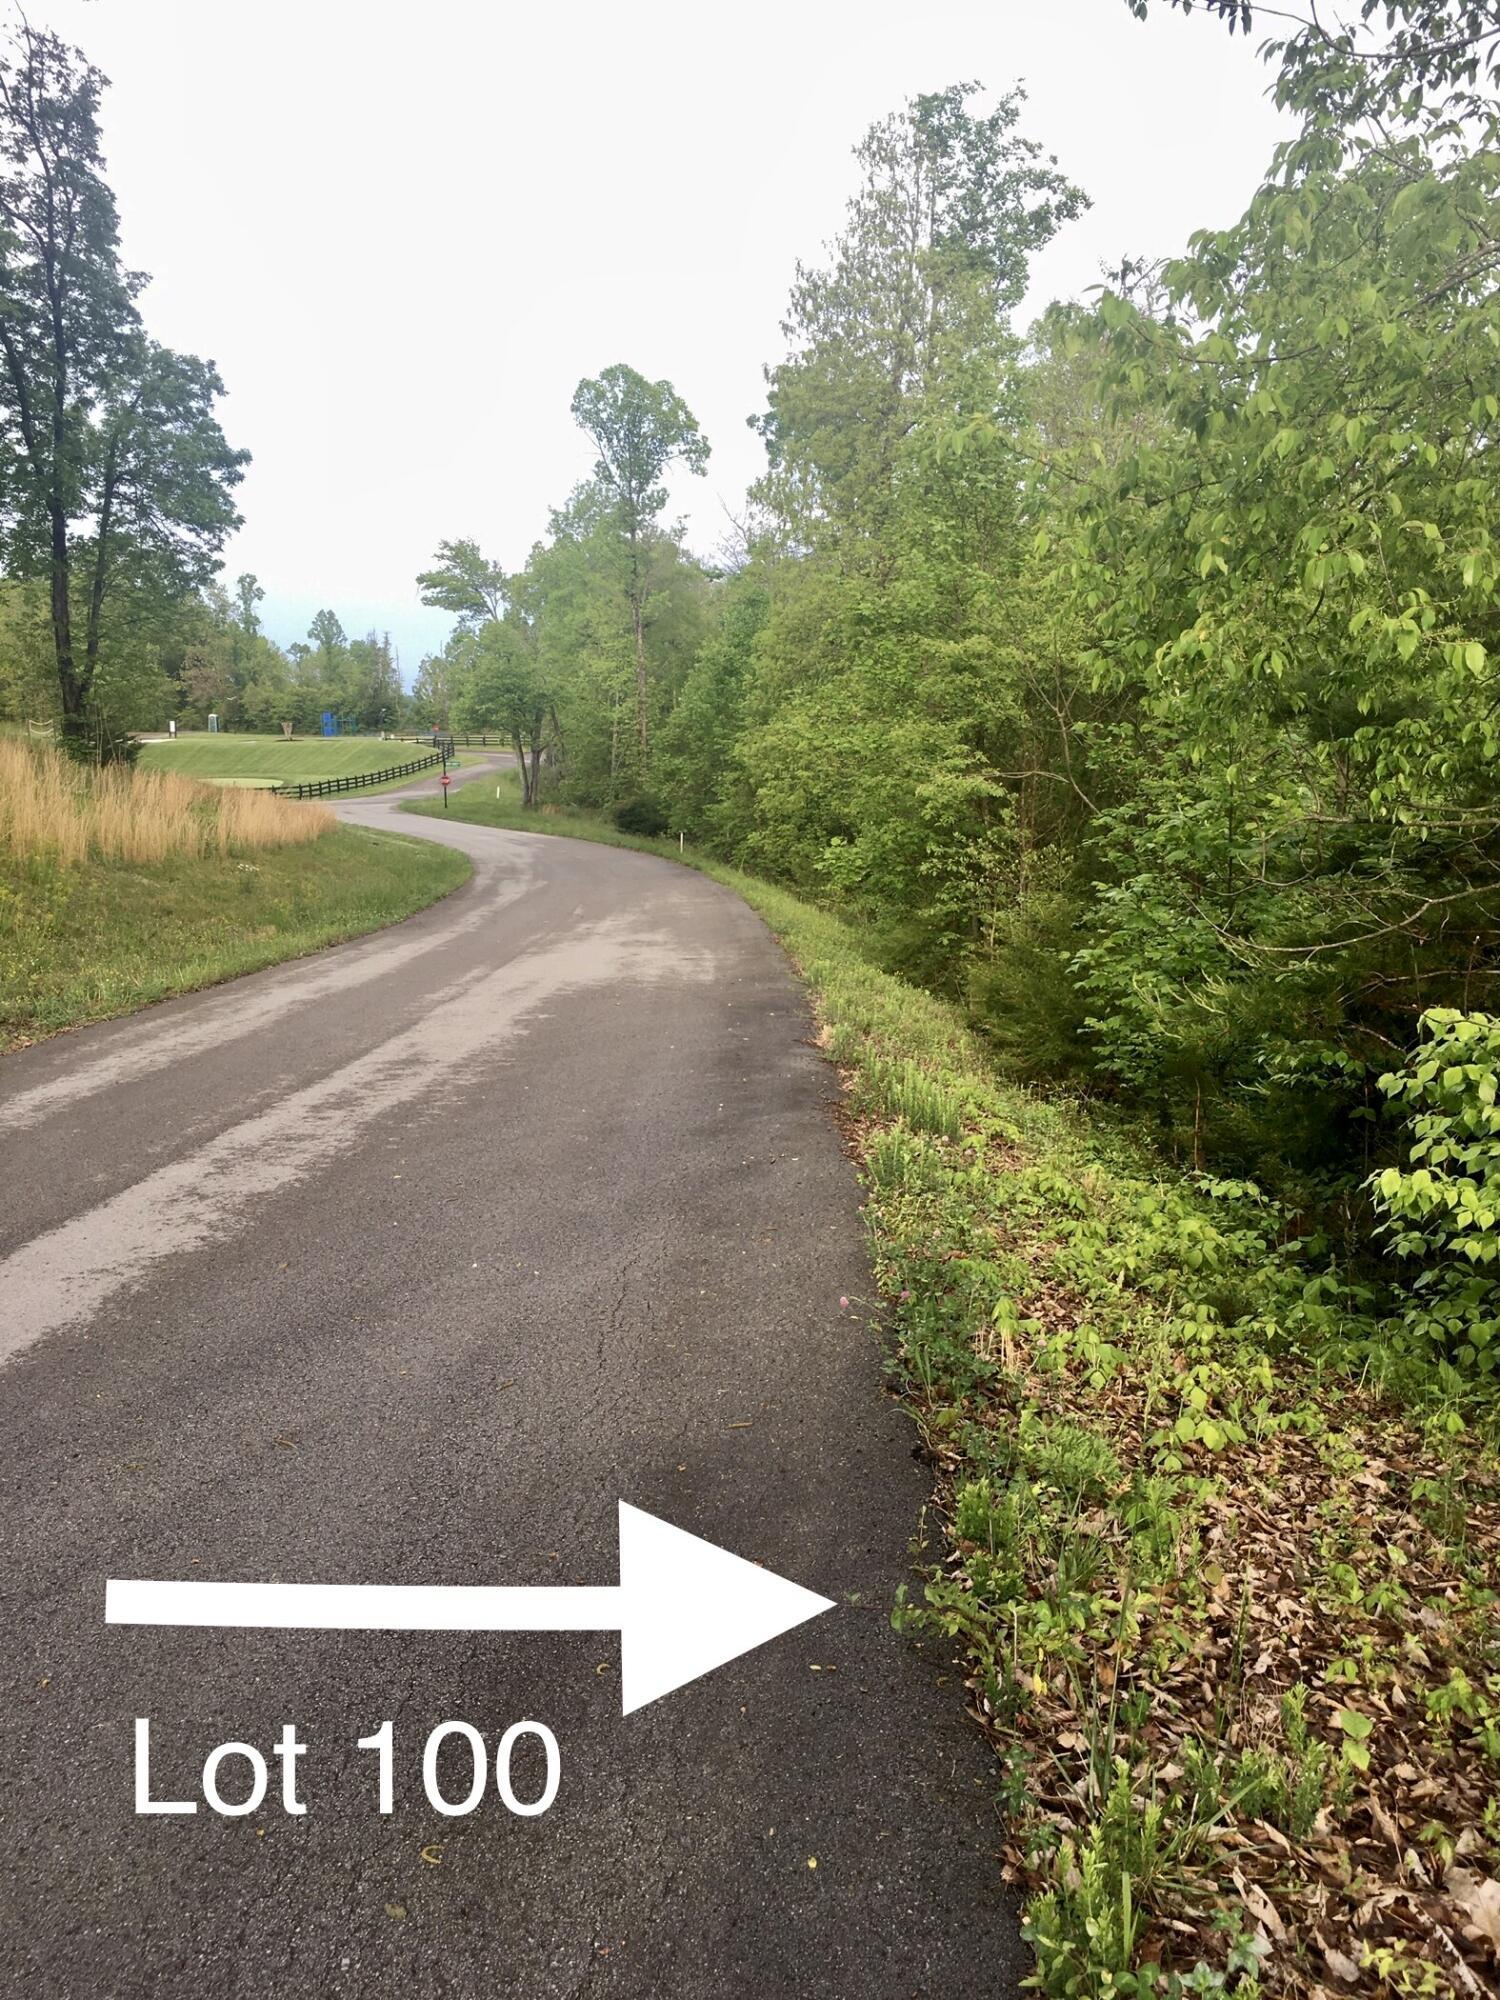 Lot 100 Flagstone Loop: